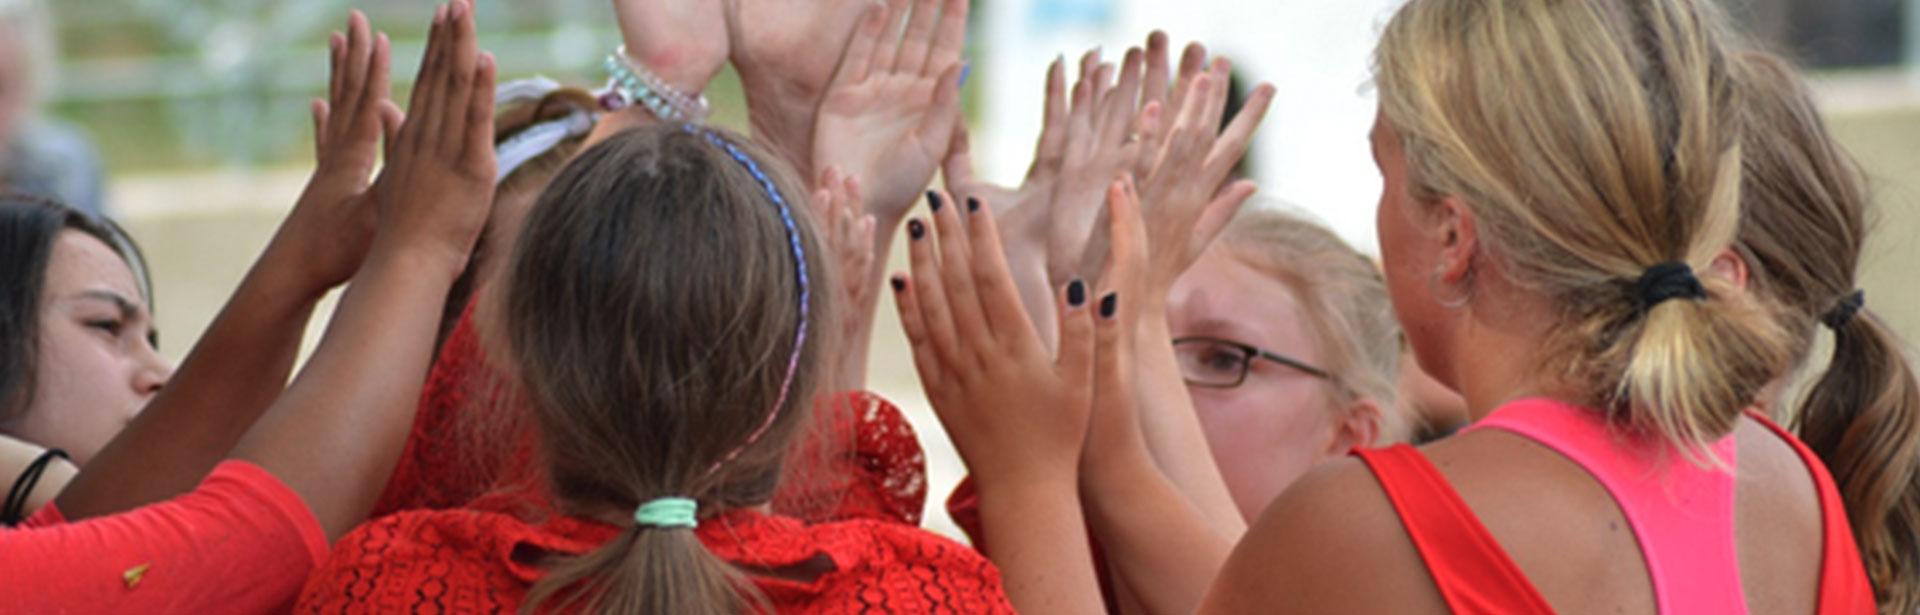 High five zum Kulturfokus – Personengruppe, die sich abklatscht